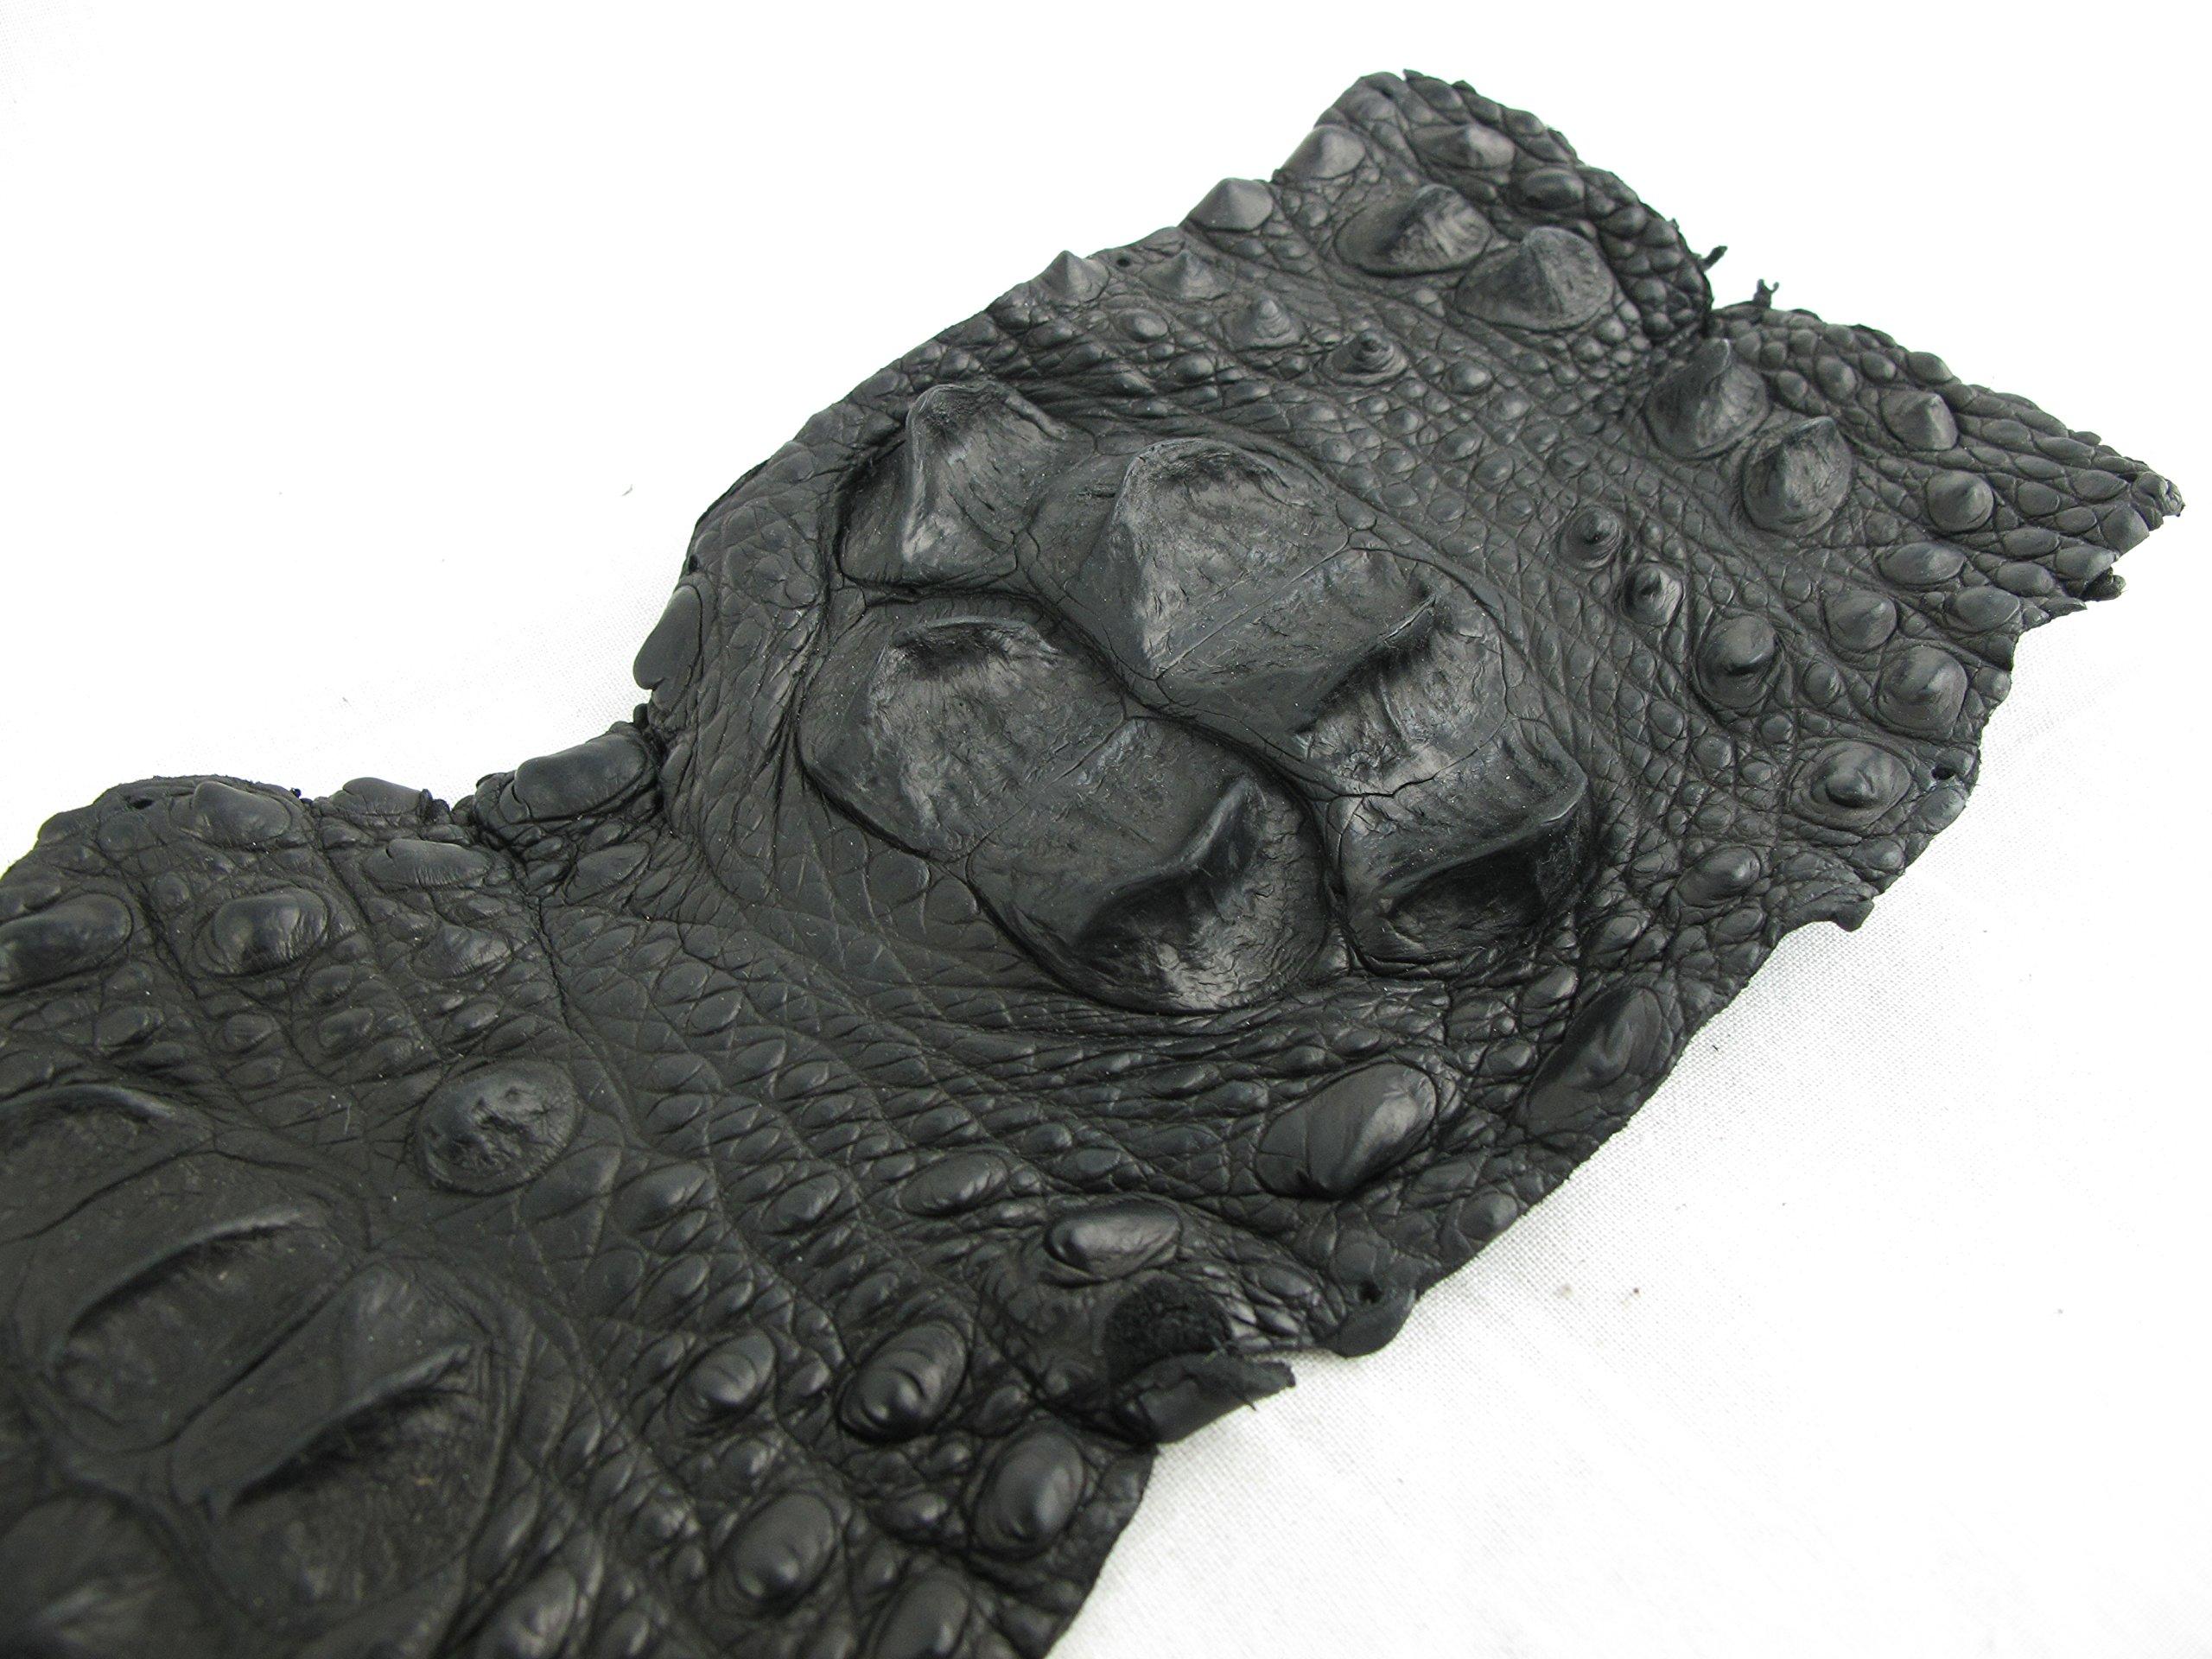 PELGIO Genuine Crocodile Alligator Hornback Skin Strap Leather Hide Pelt (5.5'' x 44'', Black)